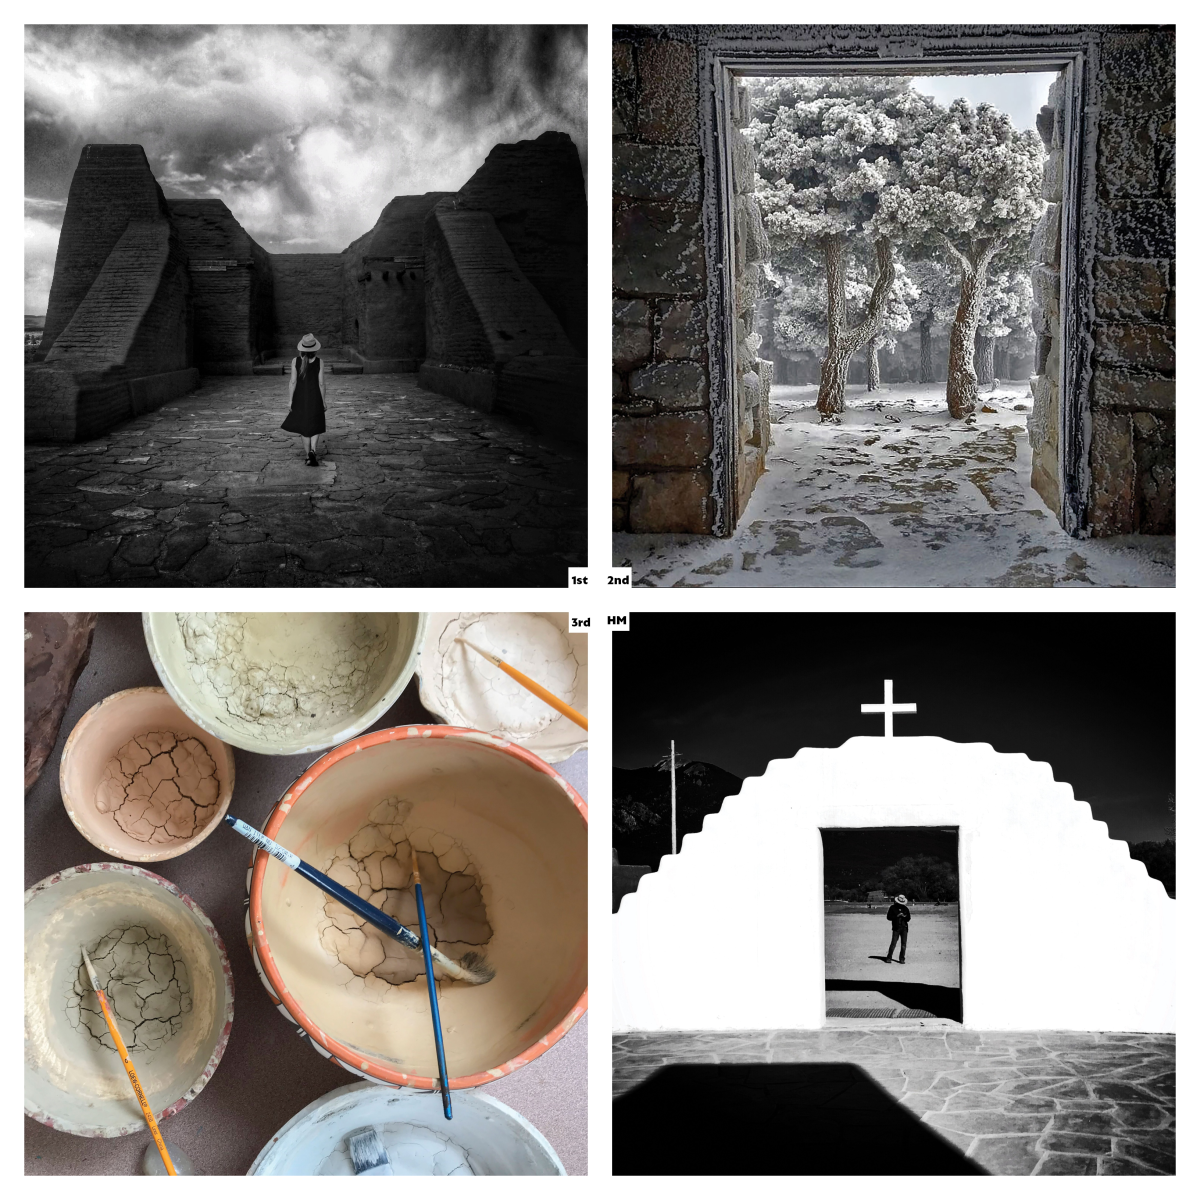 New Mexico Magazine Photo Contest: Mobile Category